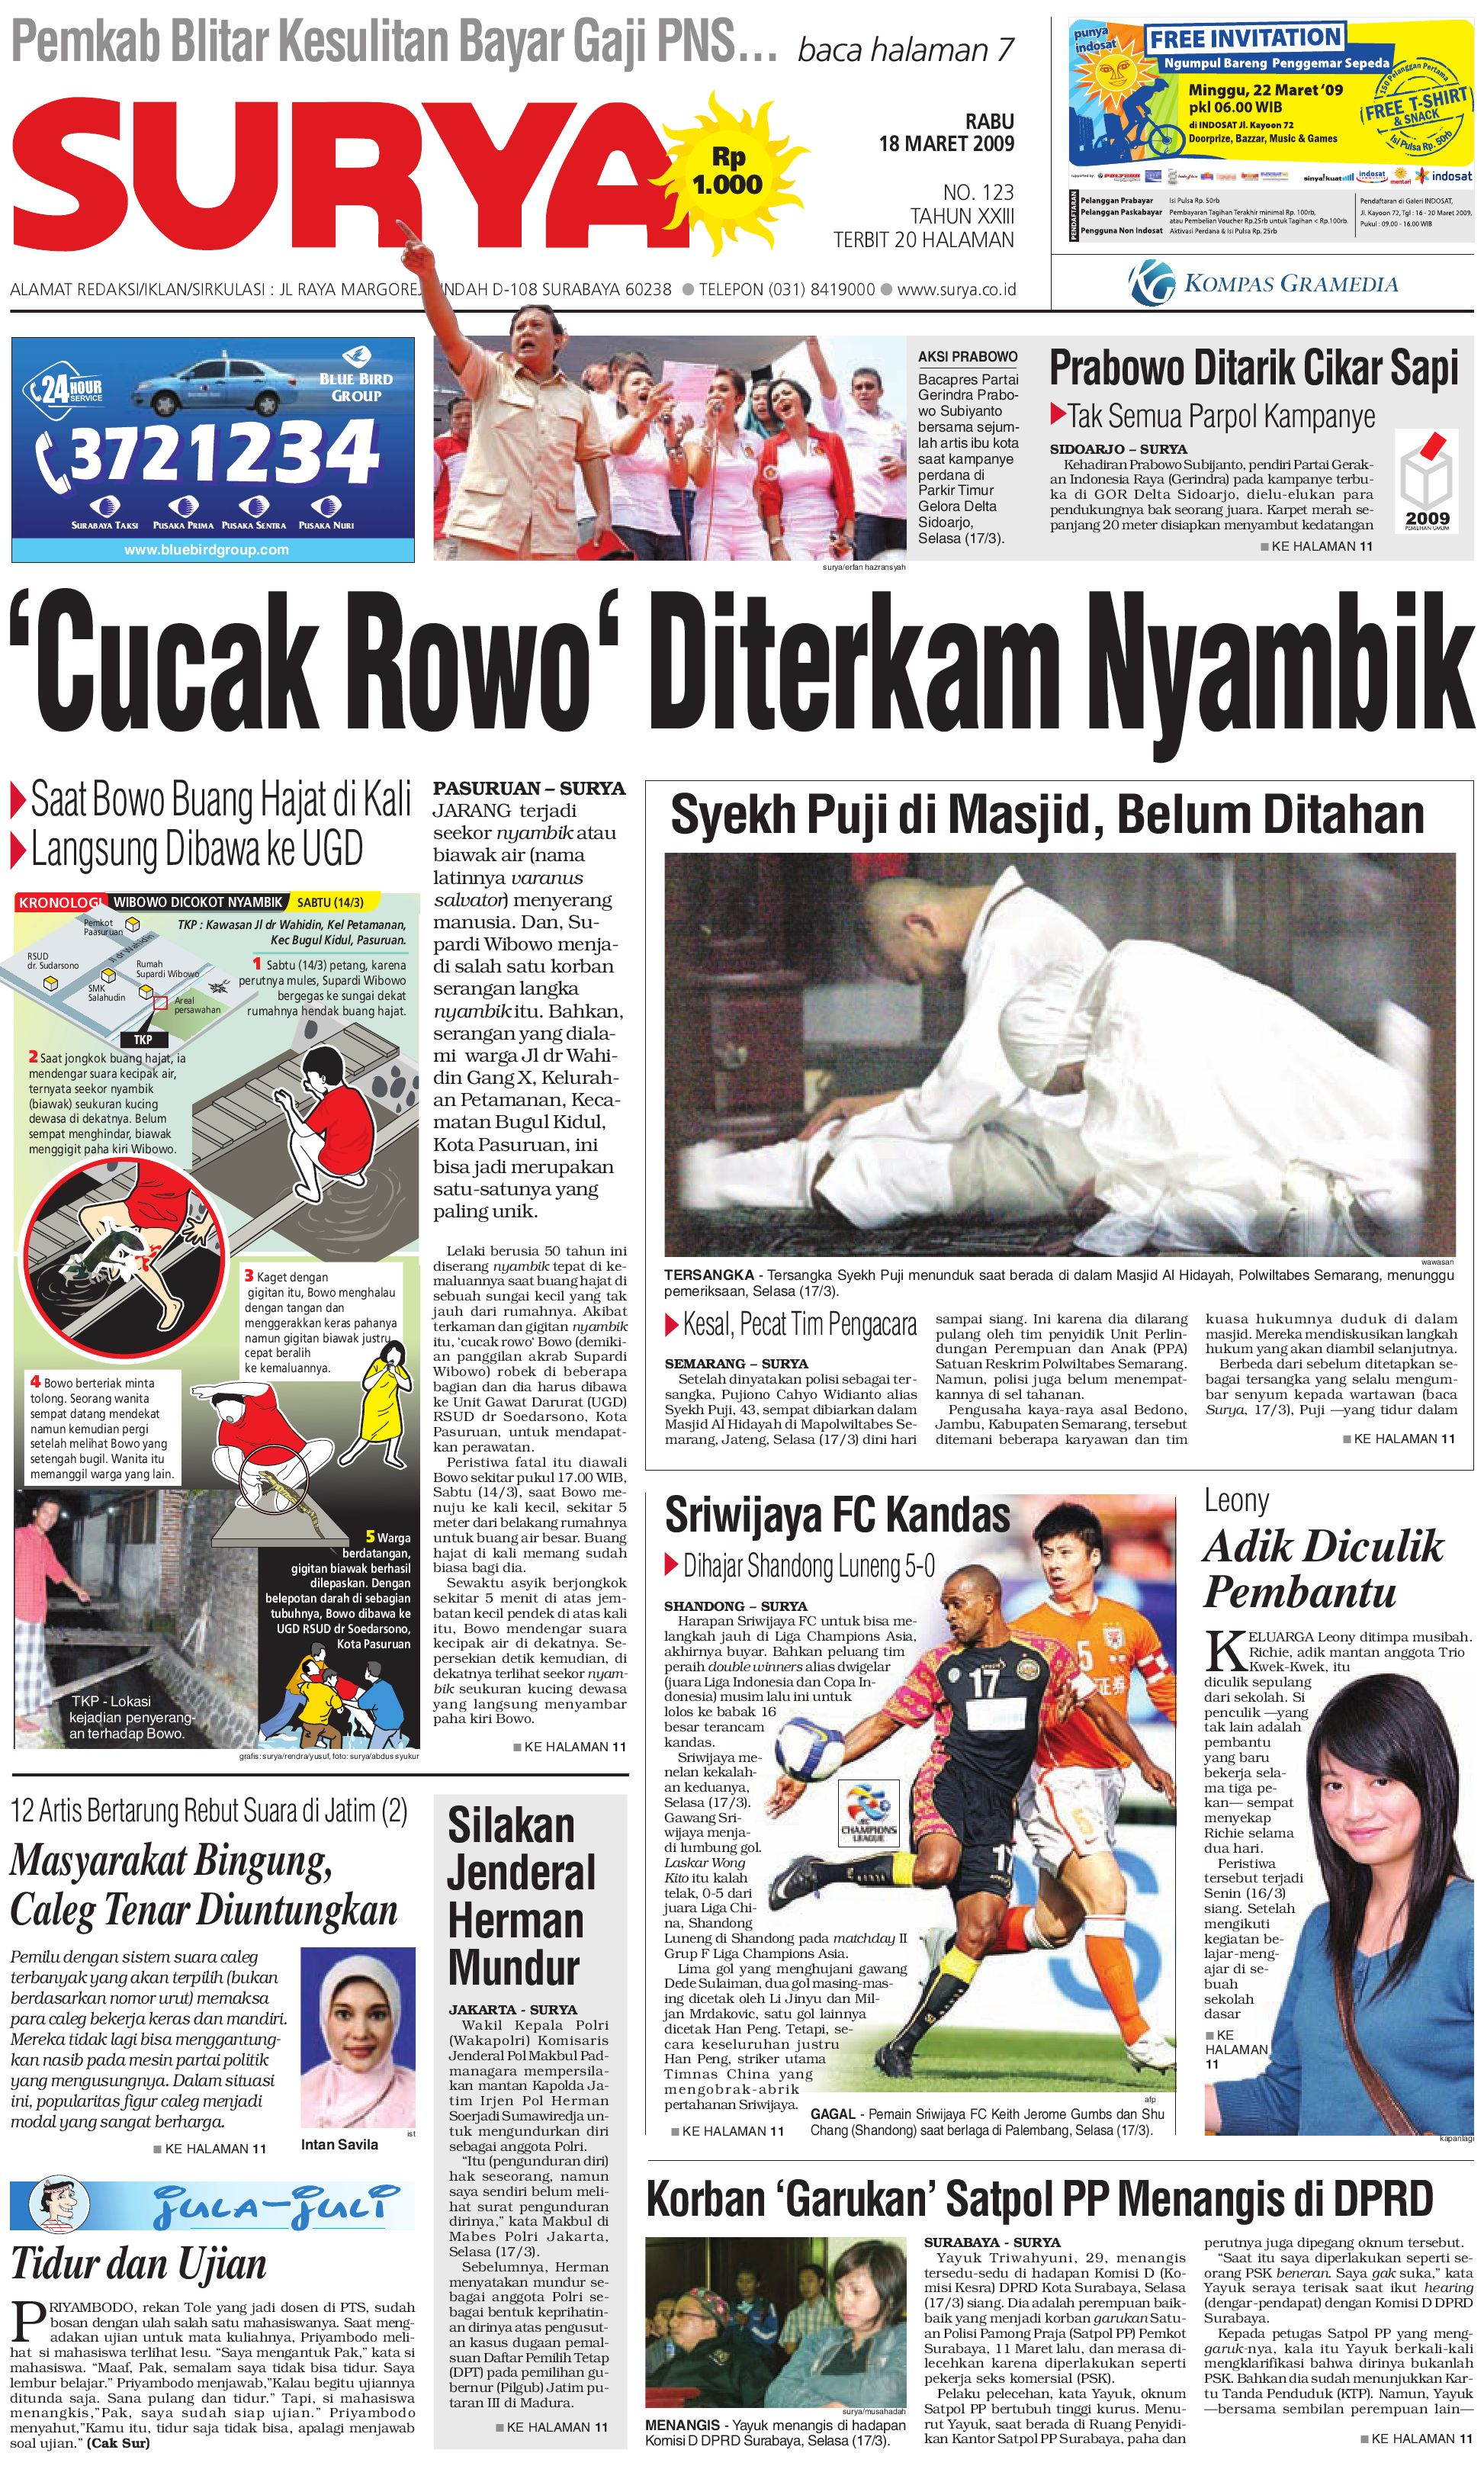 Harian Surya Edisi Cetak 18 Maret 2009 By Issuu Rejeki Anak Soleh 3 Voucher Carrefour Rp 200000